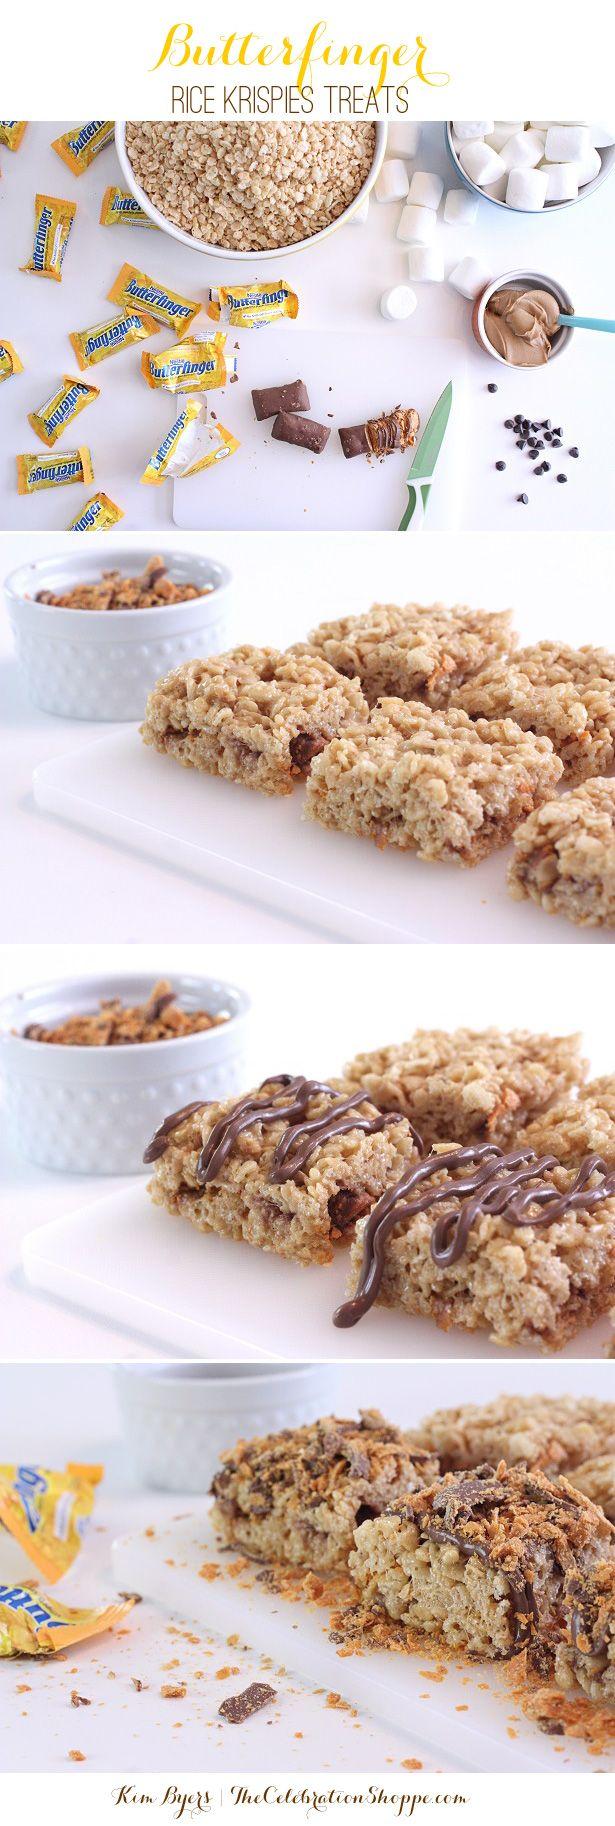 Butterfinger Rice Krispies Recipe Treats